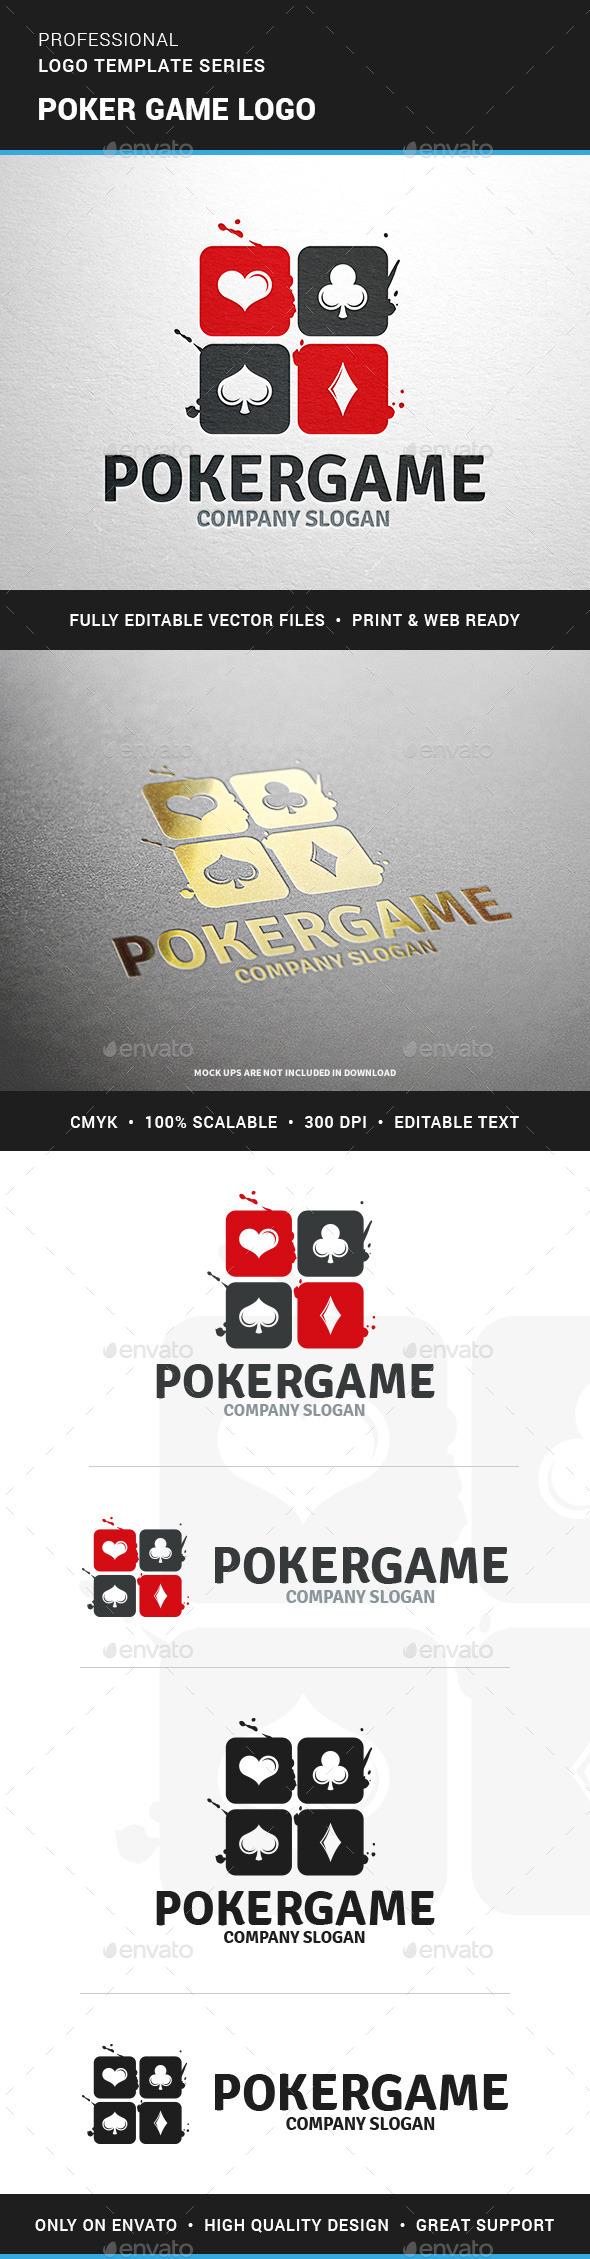 Poker Game Logo Template